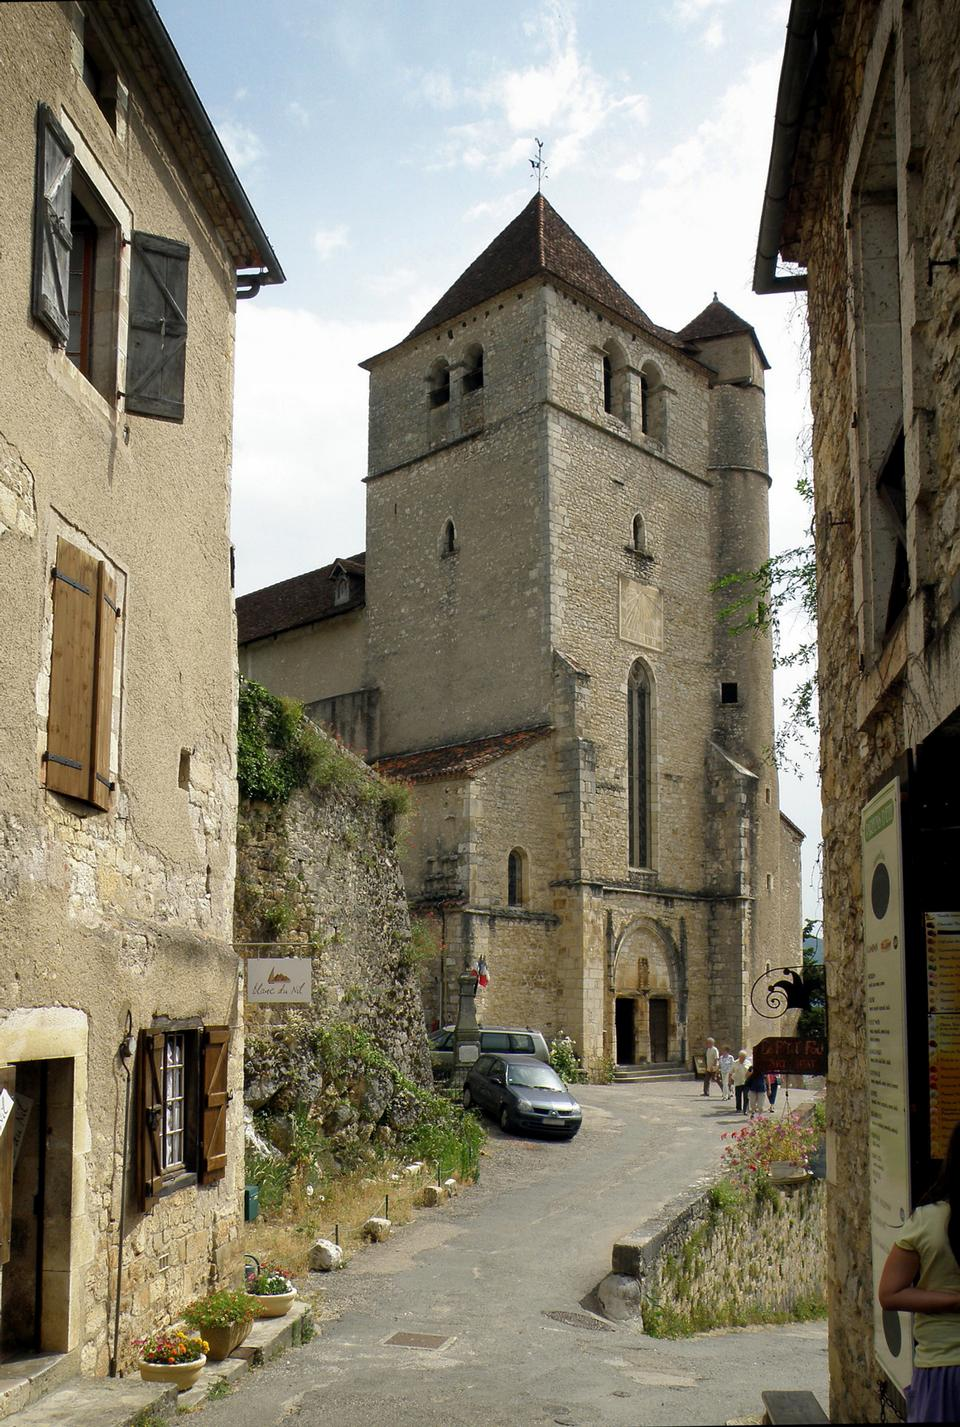 A sight of a small street in Saint-Cirq Lapopie village